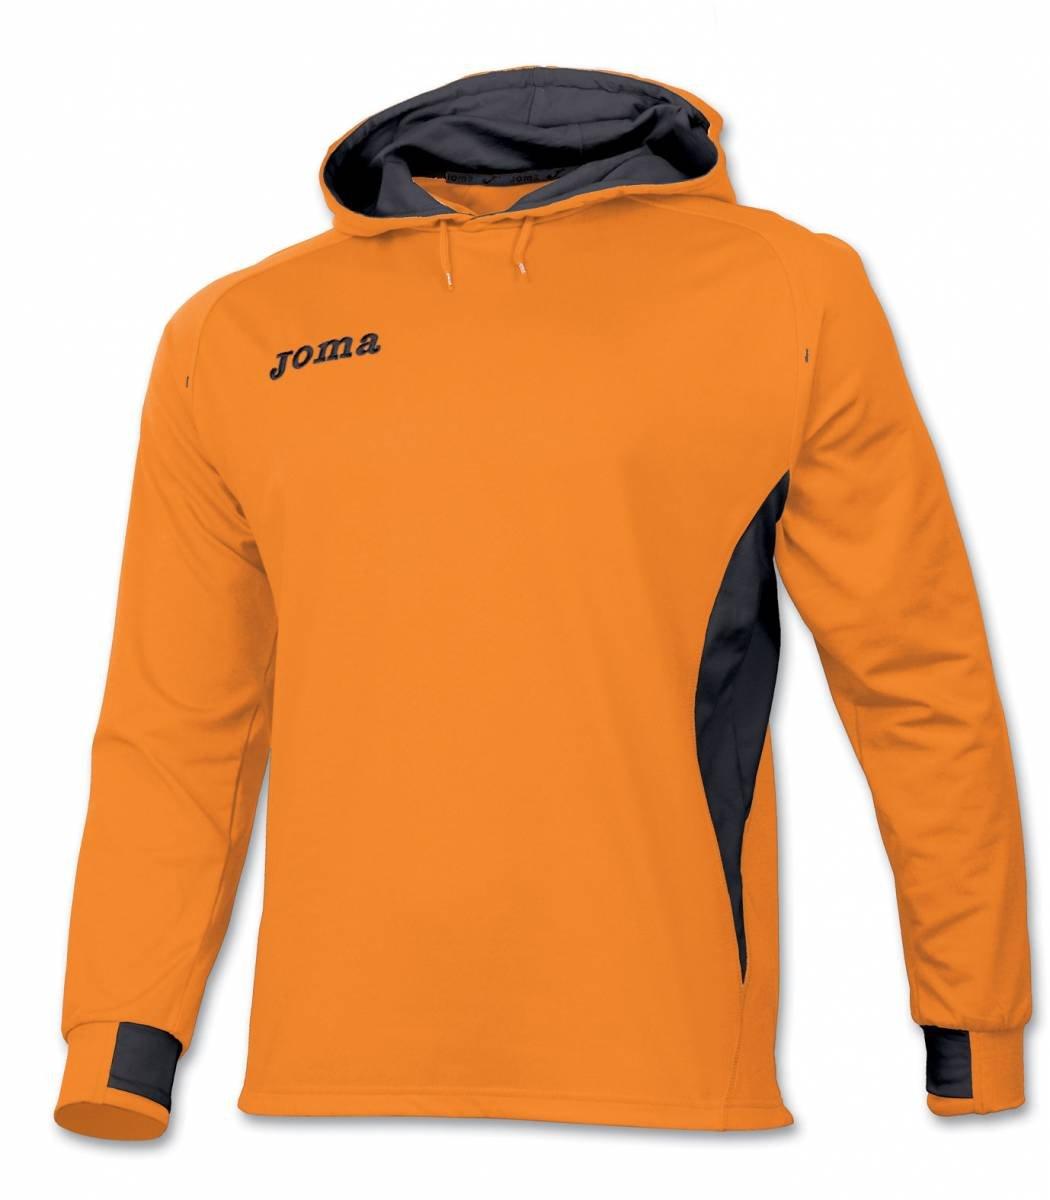 Joma sport - Joma elite iii, sudadera con capucha, color naranja ...